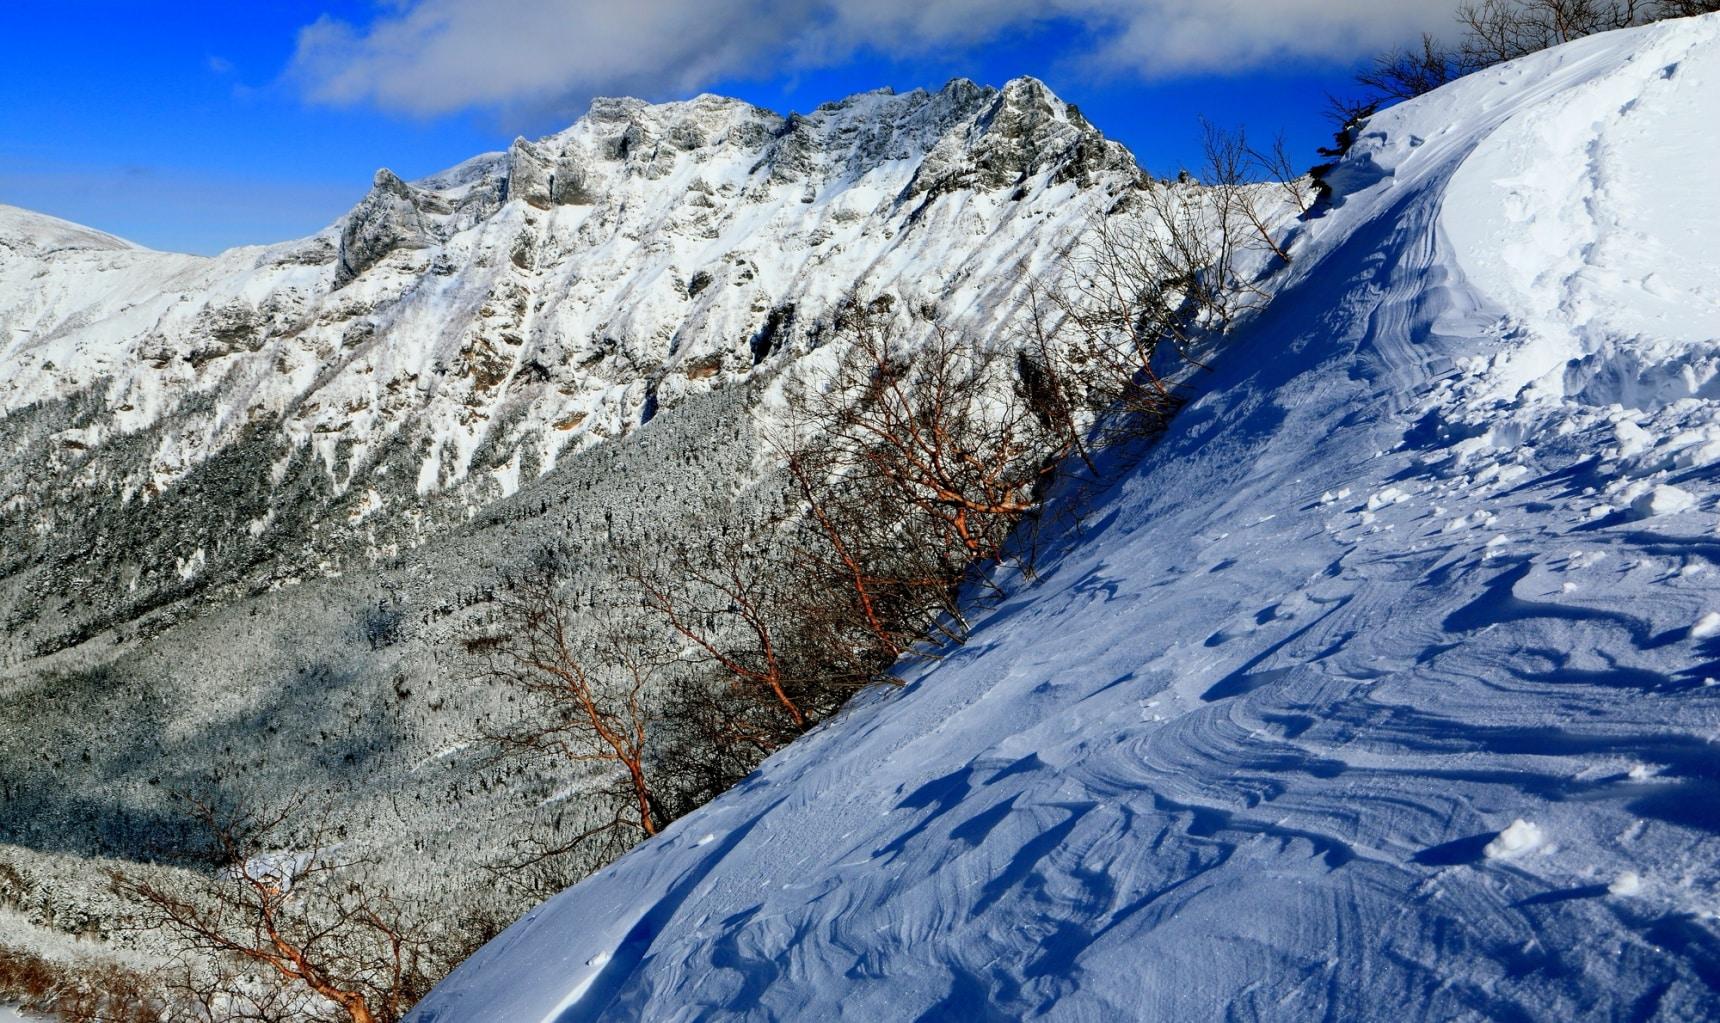 8 Incredible Snow Scenes in Japan